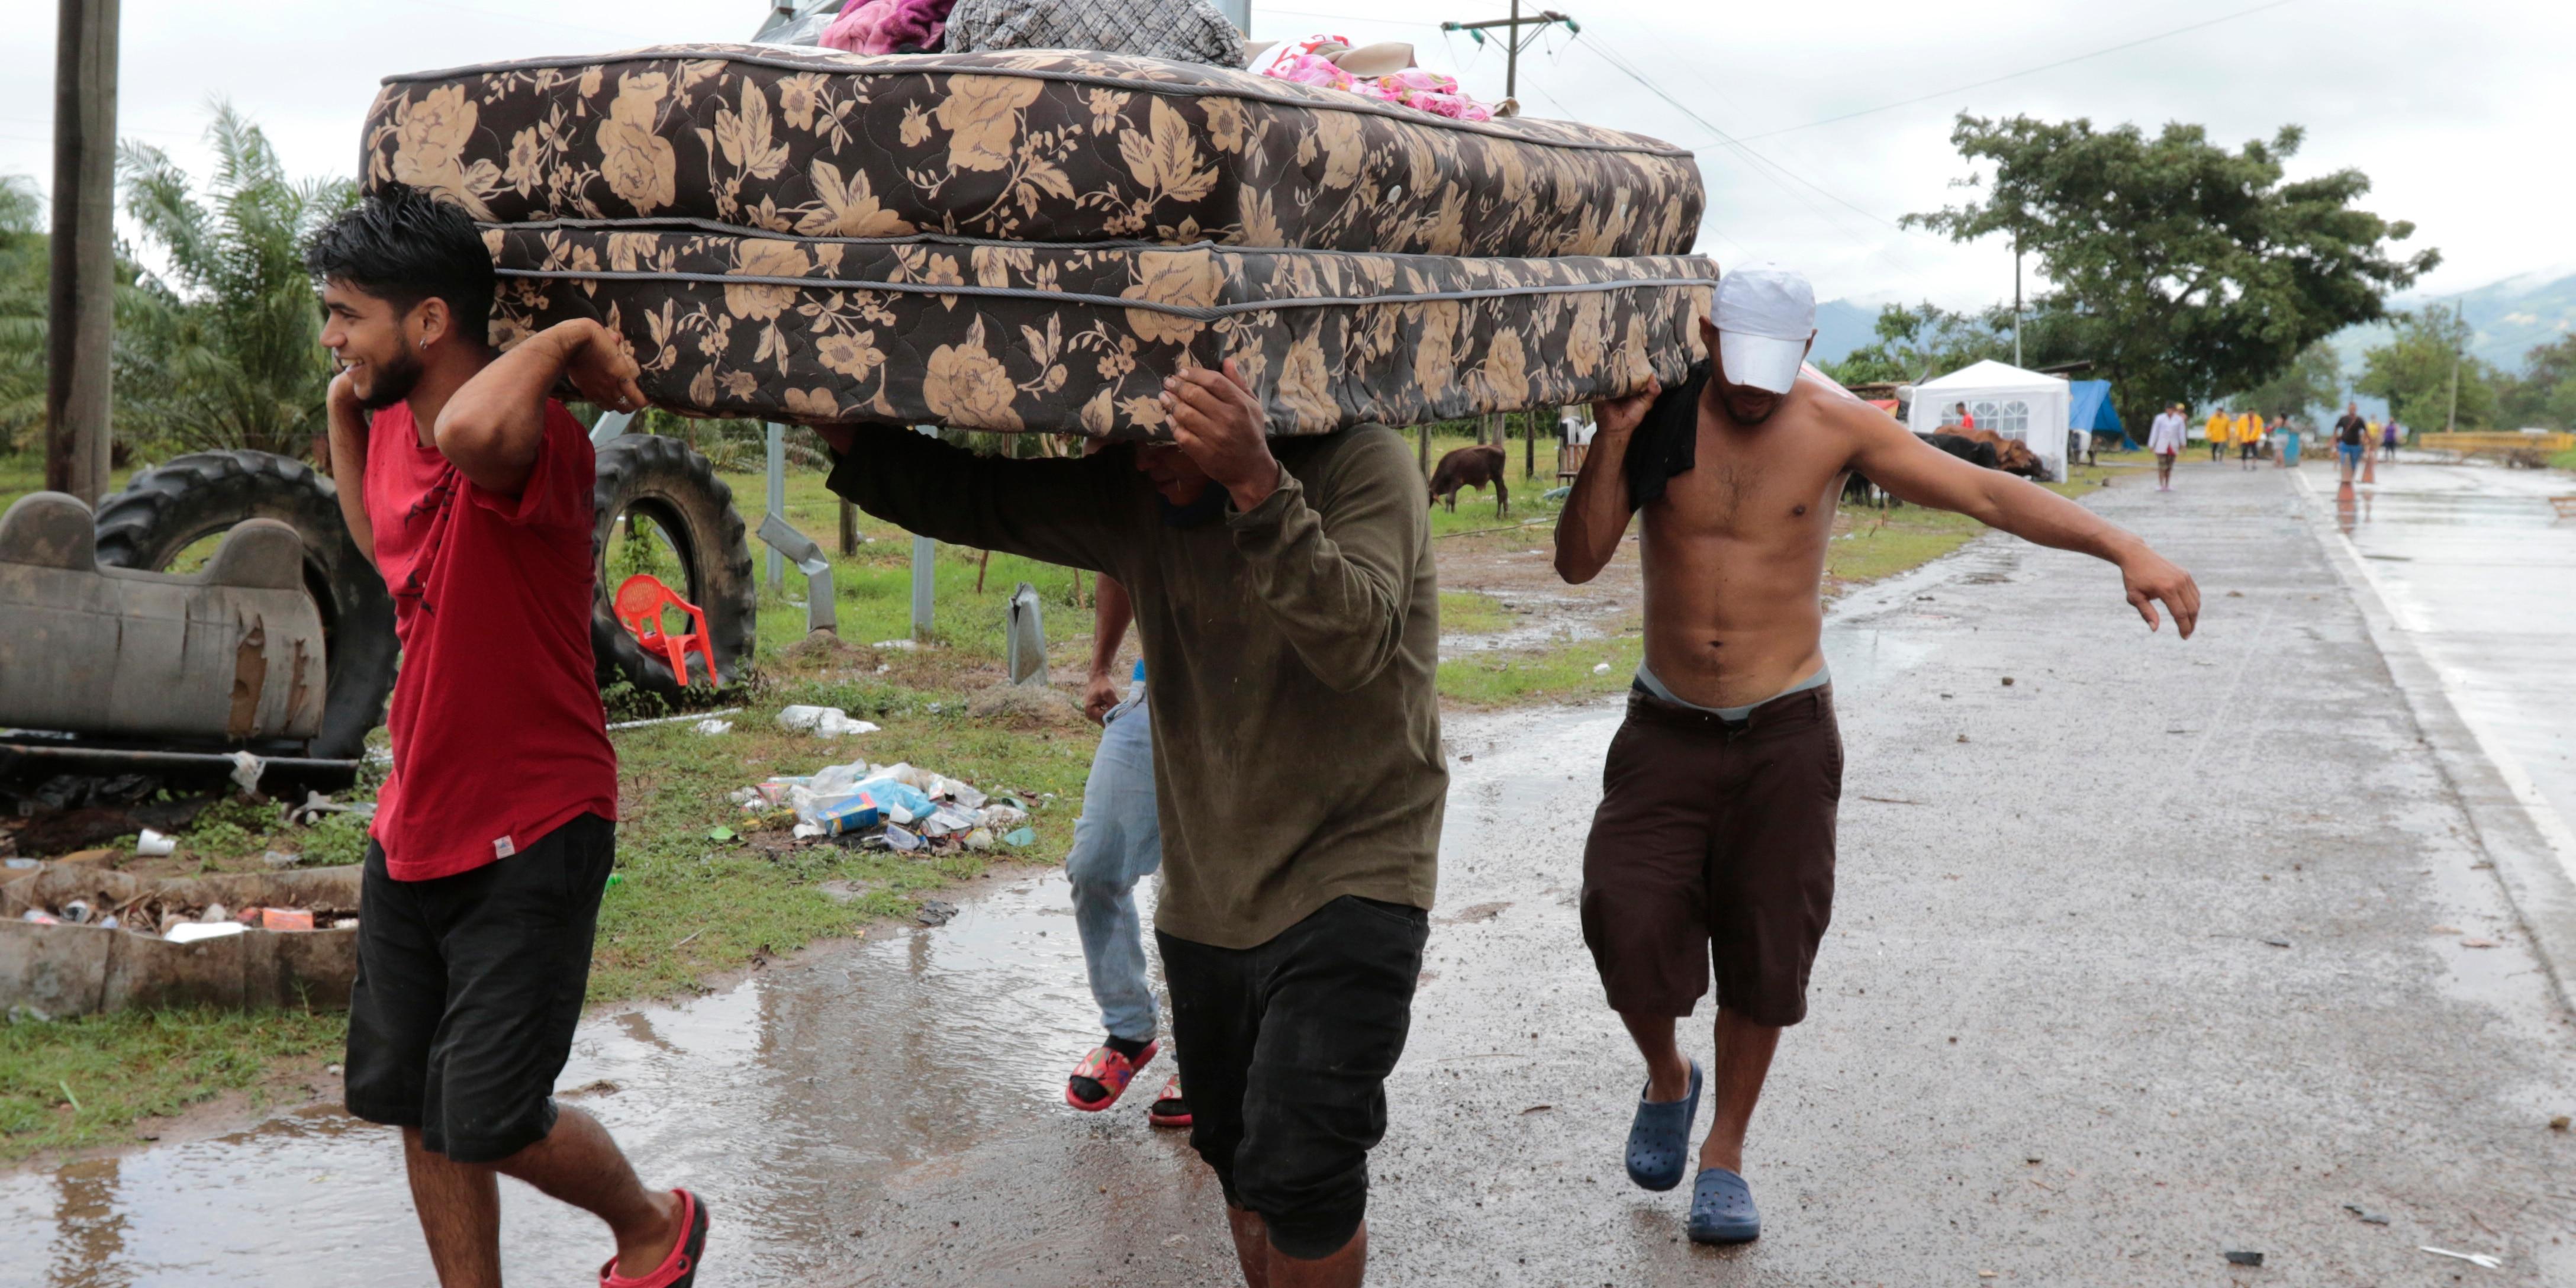 Neighbors help each other as they evacuate the area before Hurricane Iota makes landfall in San Manuel Cortes, Honduras, Monday, November 16, 2020.